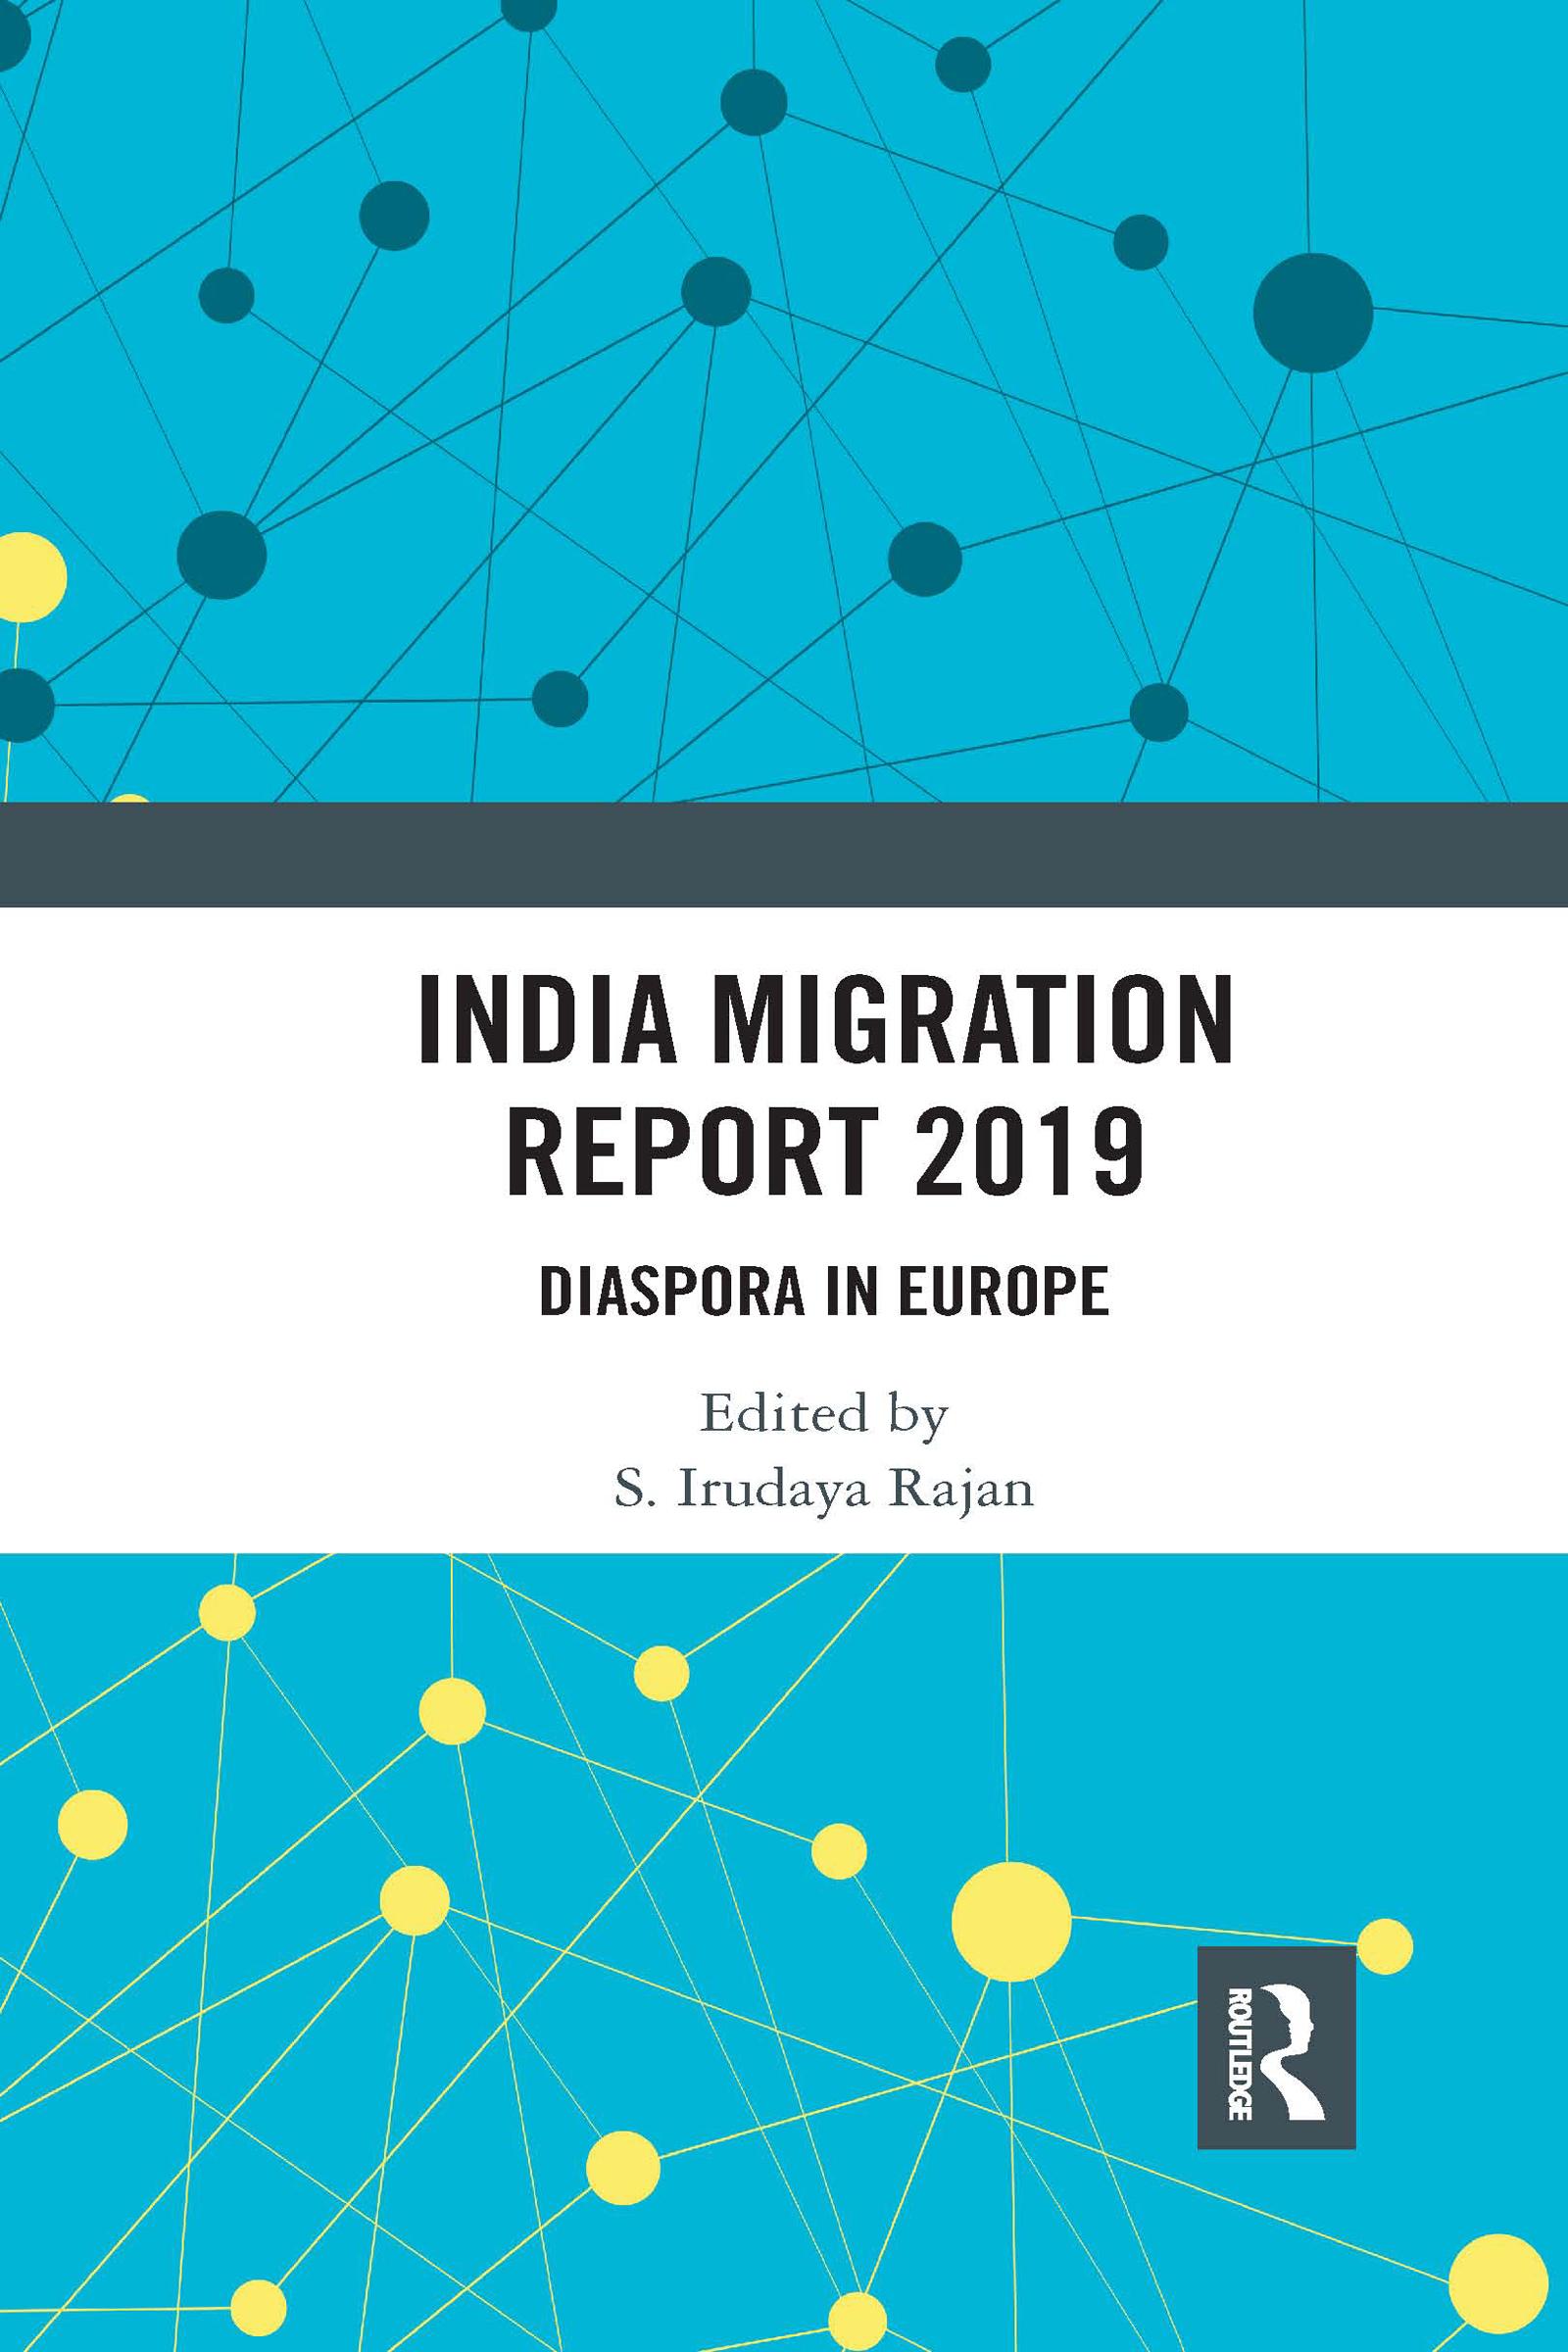 India Migration Report 2019